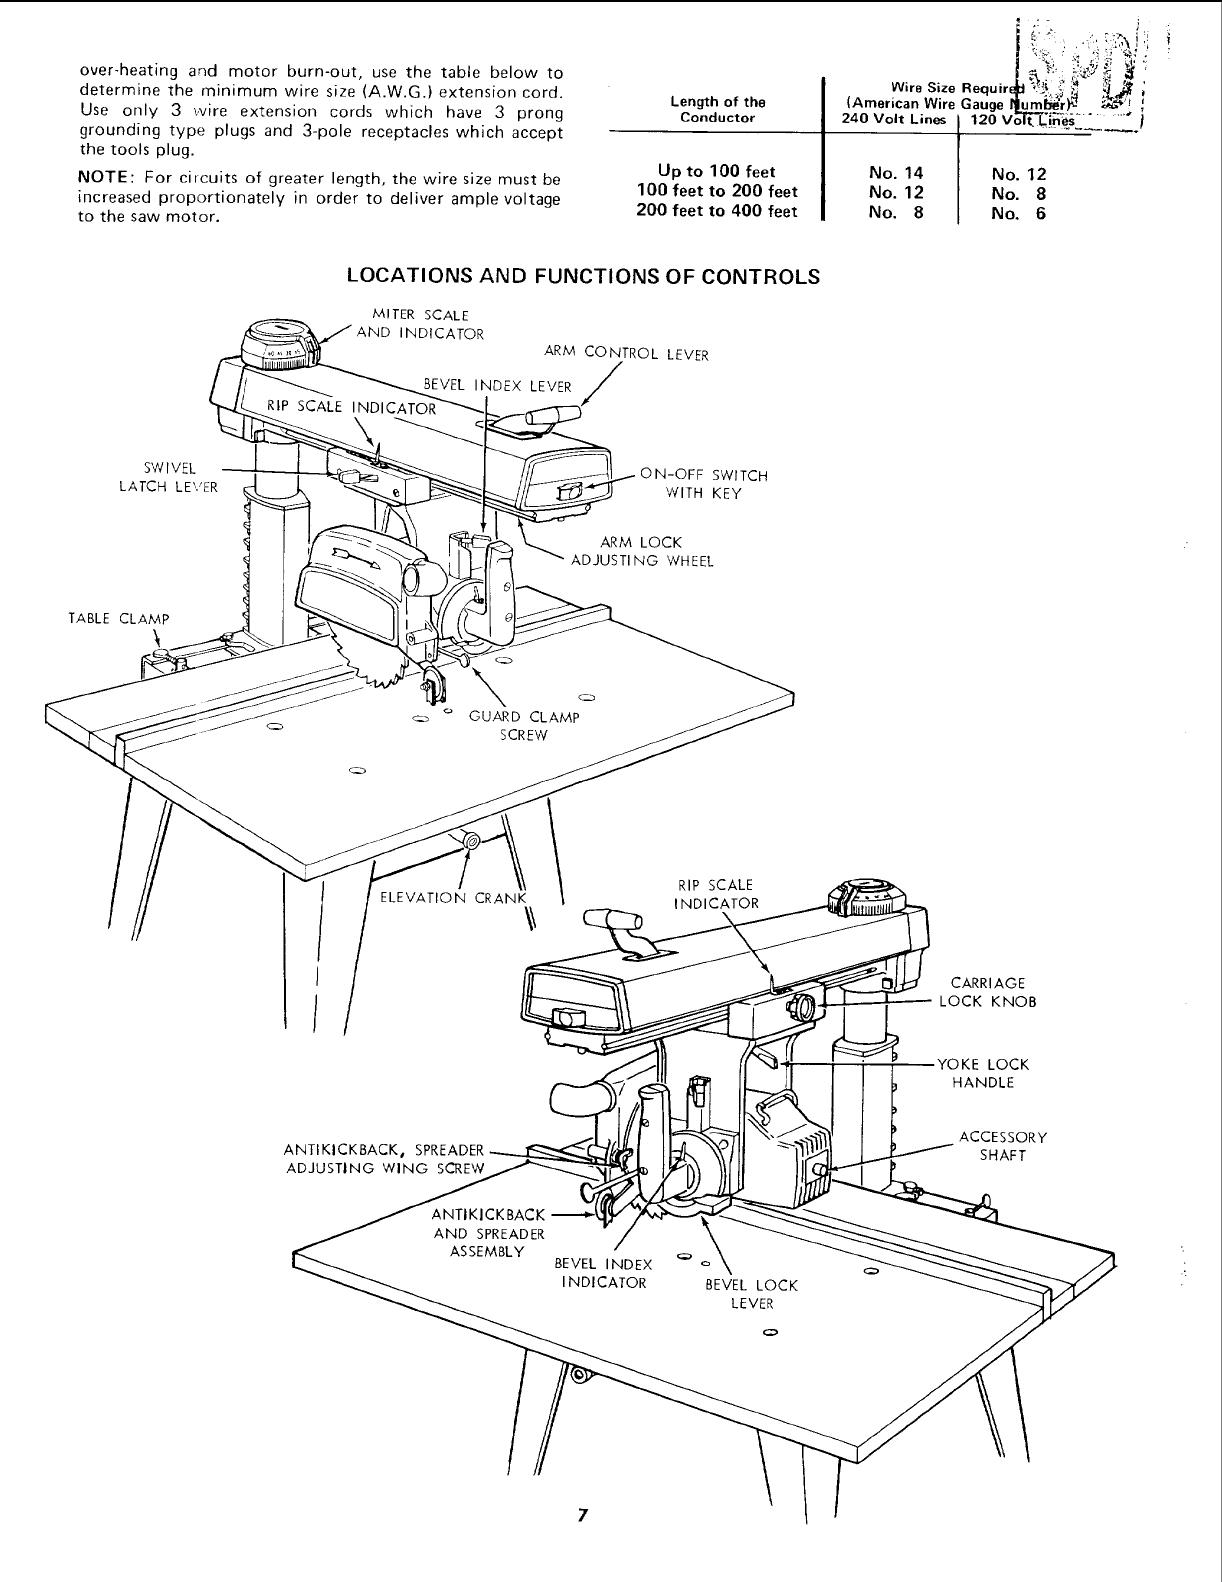 Craftsman 11319770 User Manual 10 INCH RADIAL SAW Manuals